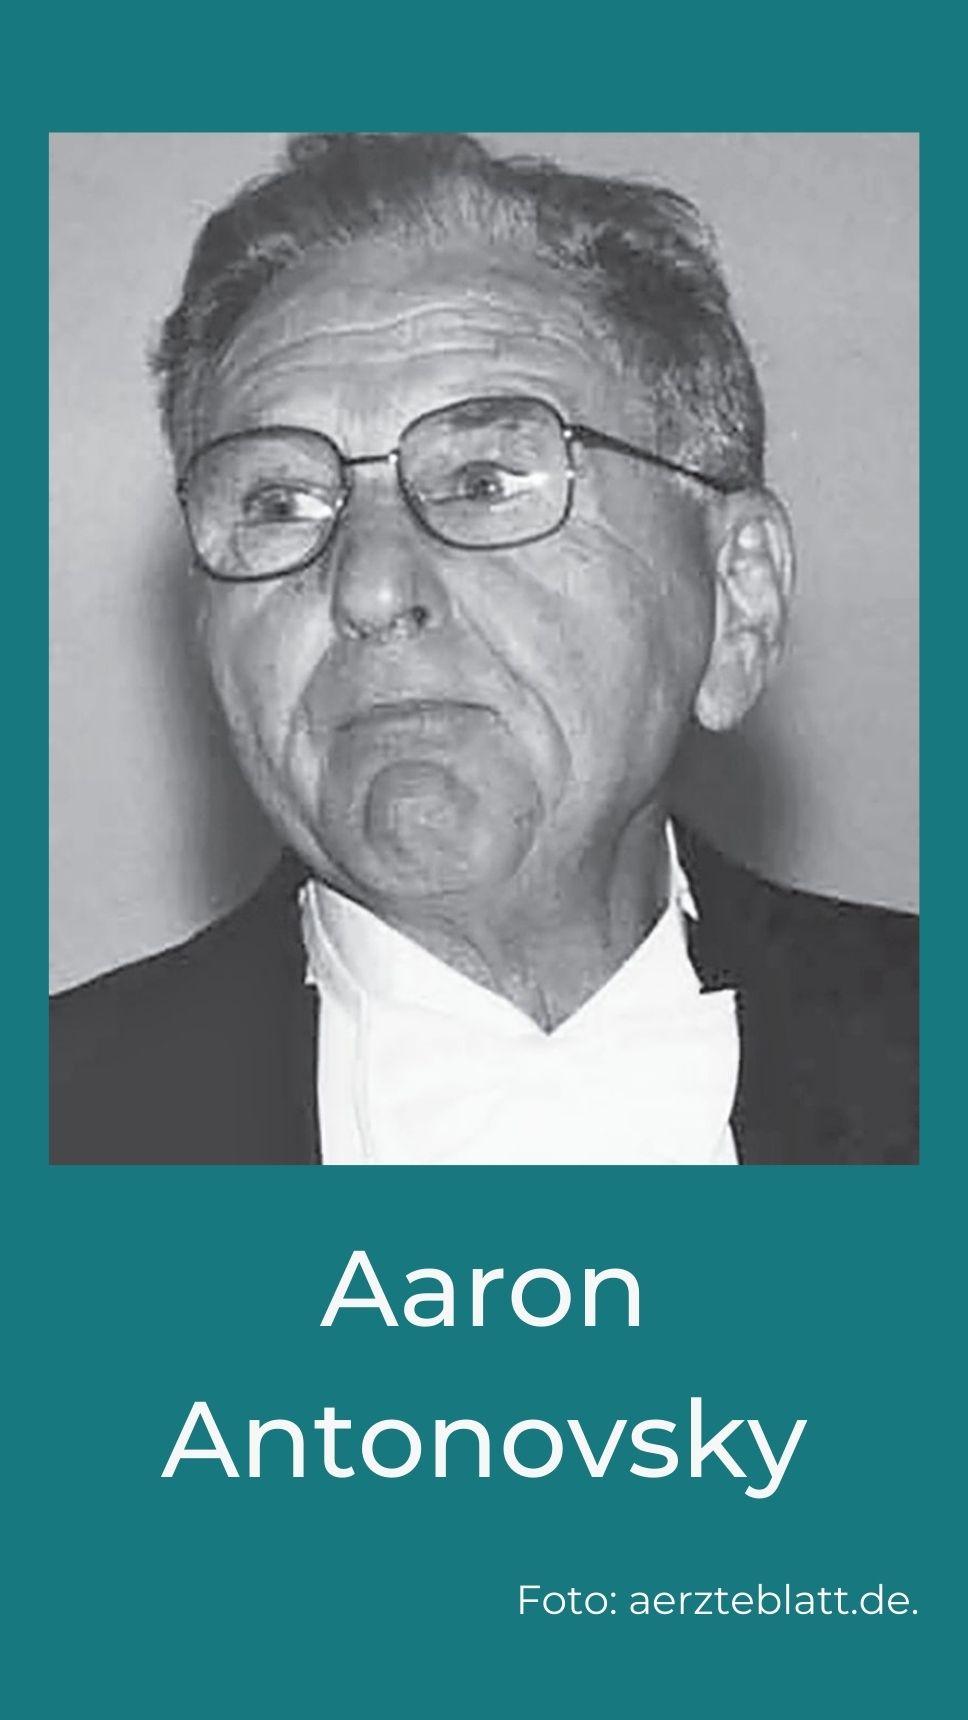 Aaron Antonovsky